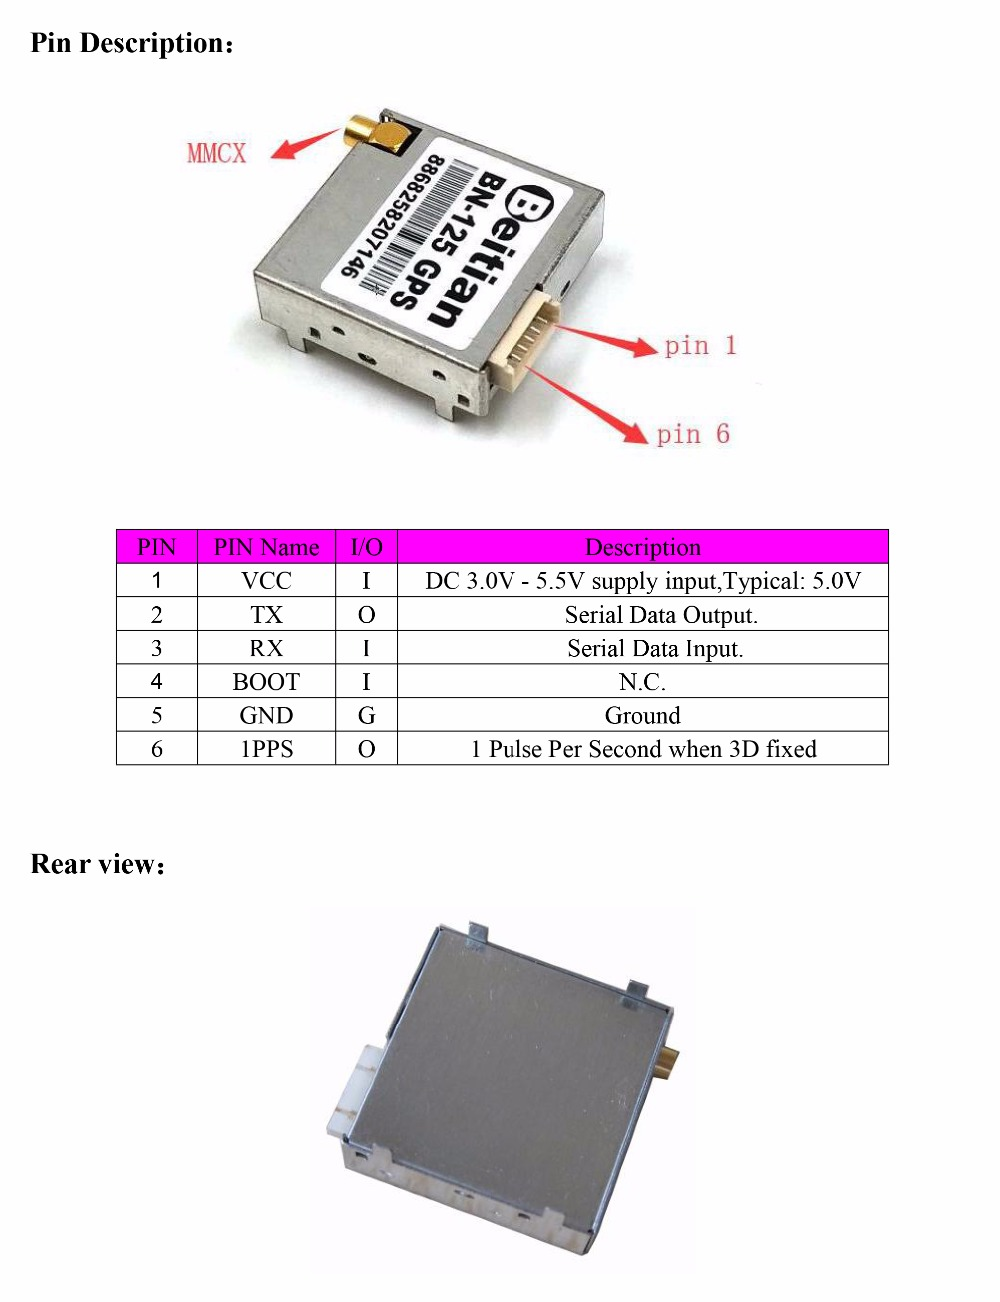 BN-125 GPS Module datasheet-3